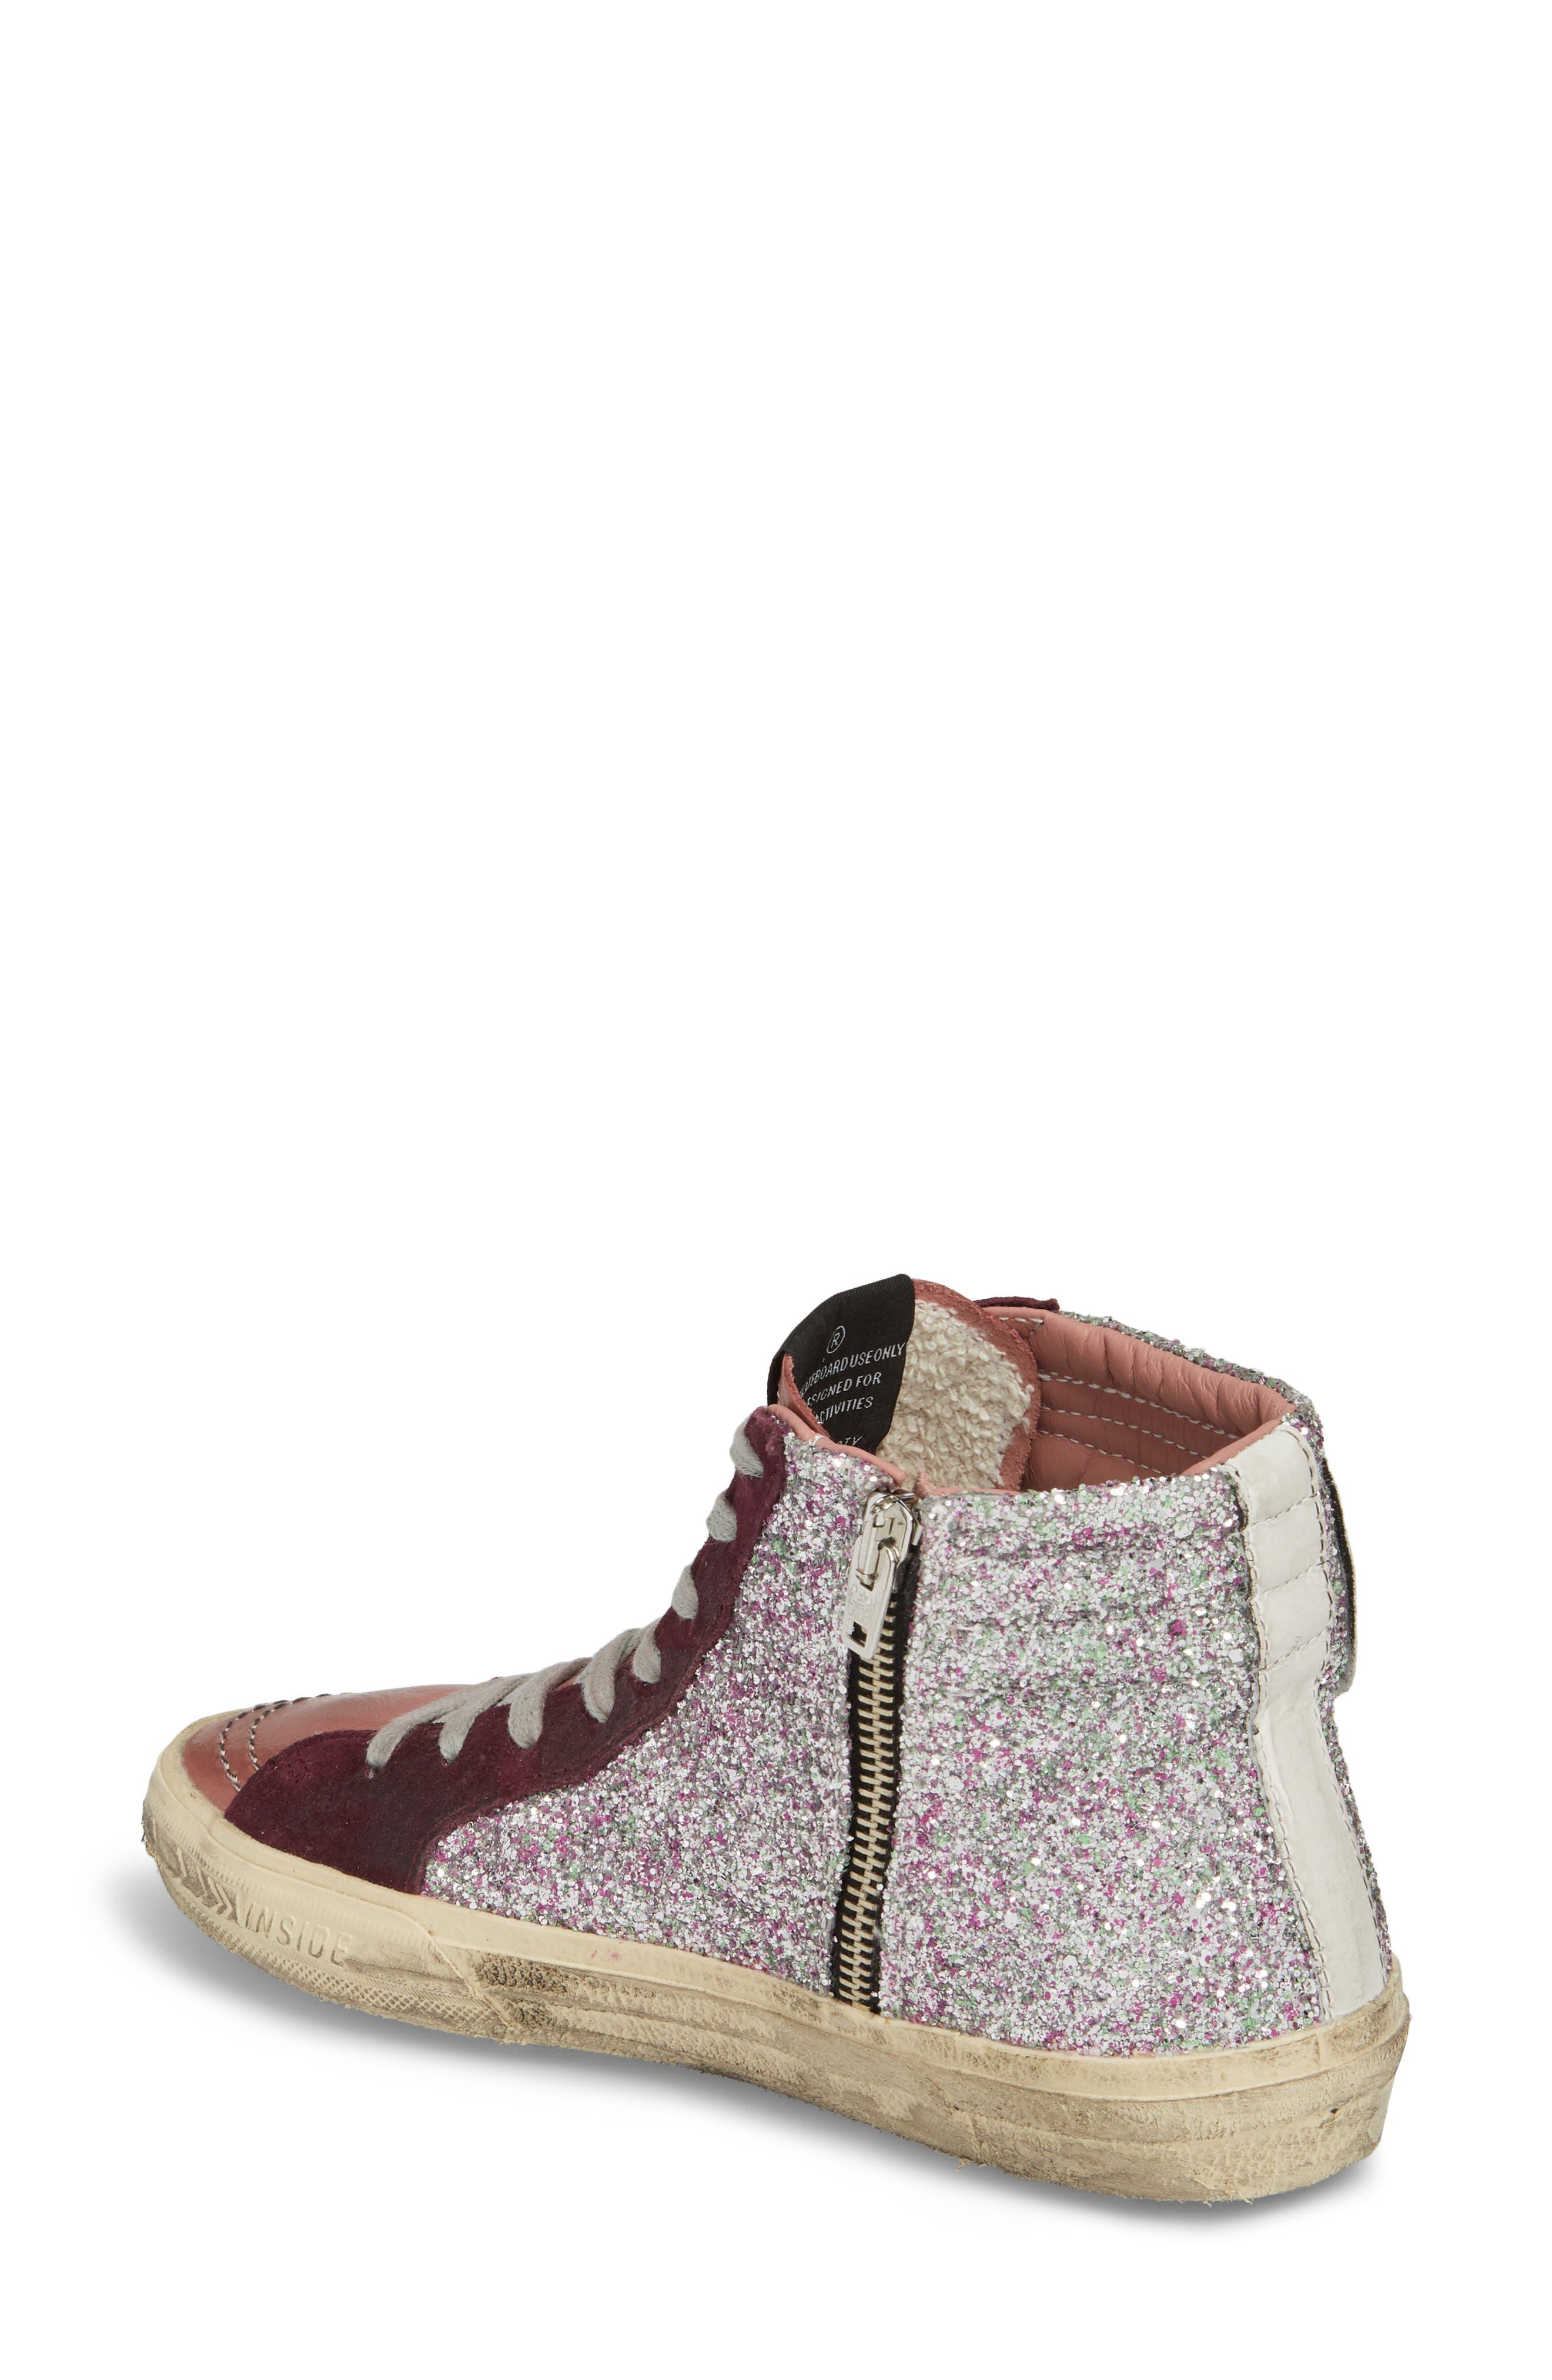 Slide High Top Sneaker,                             Alternate thumbnail 2, color,                             Bordeaux / Pink/ Gold